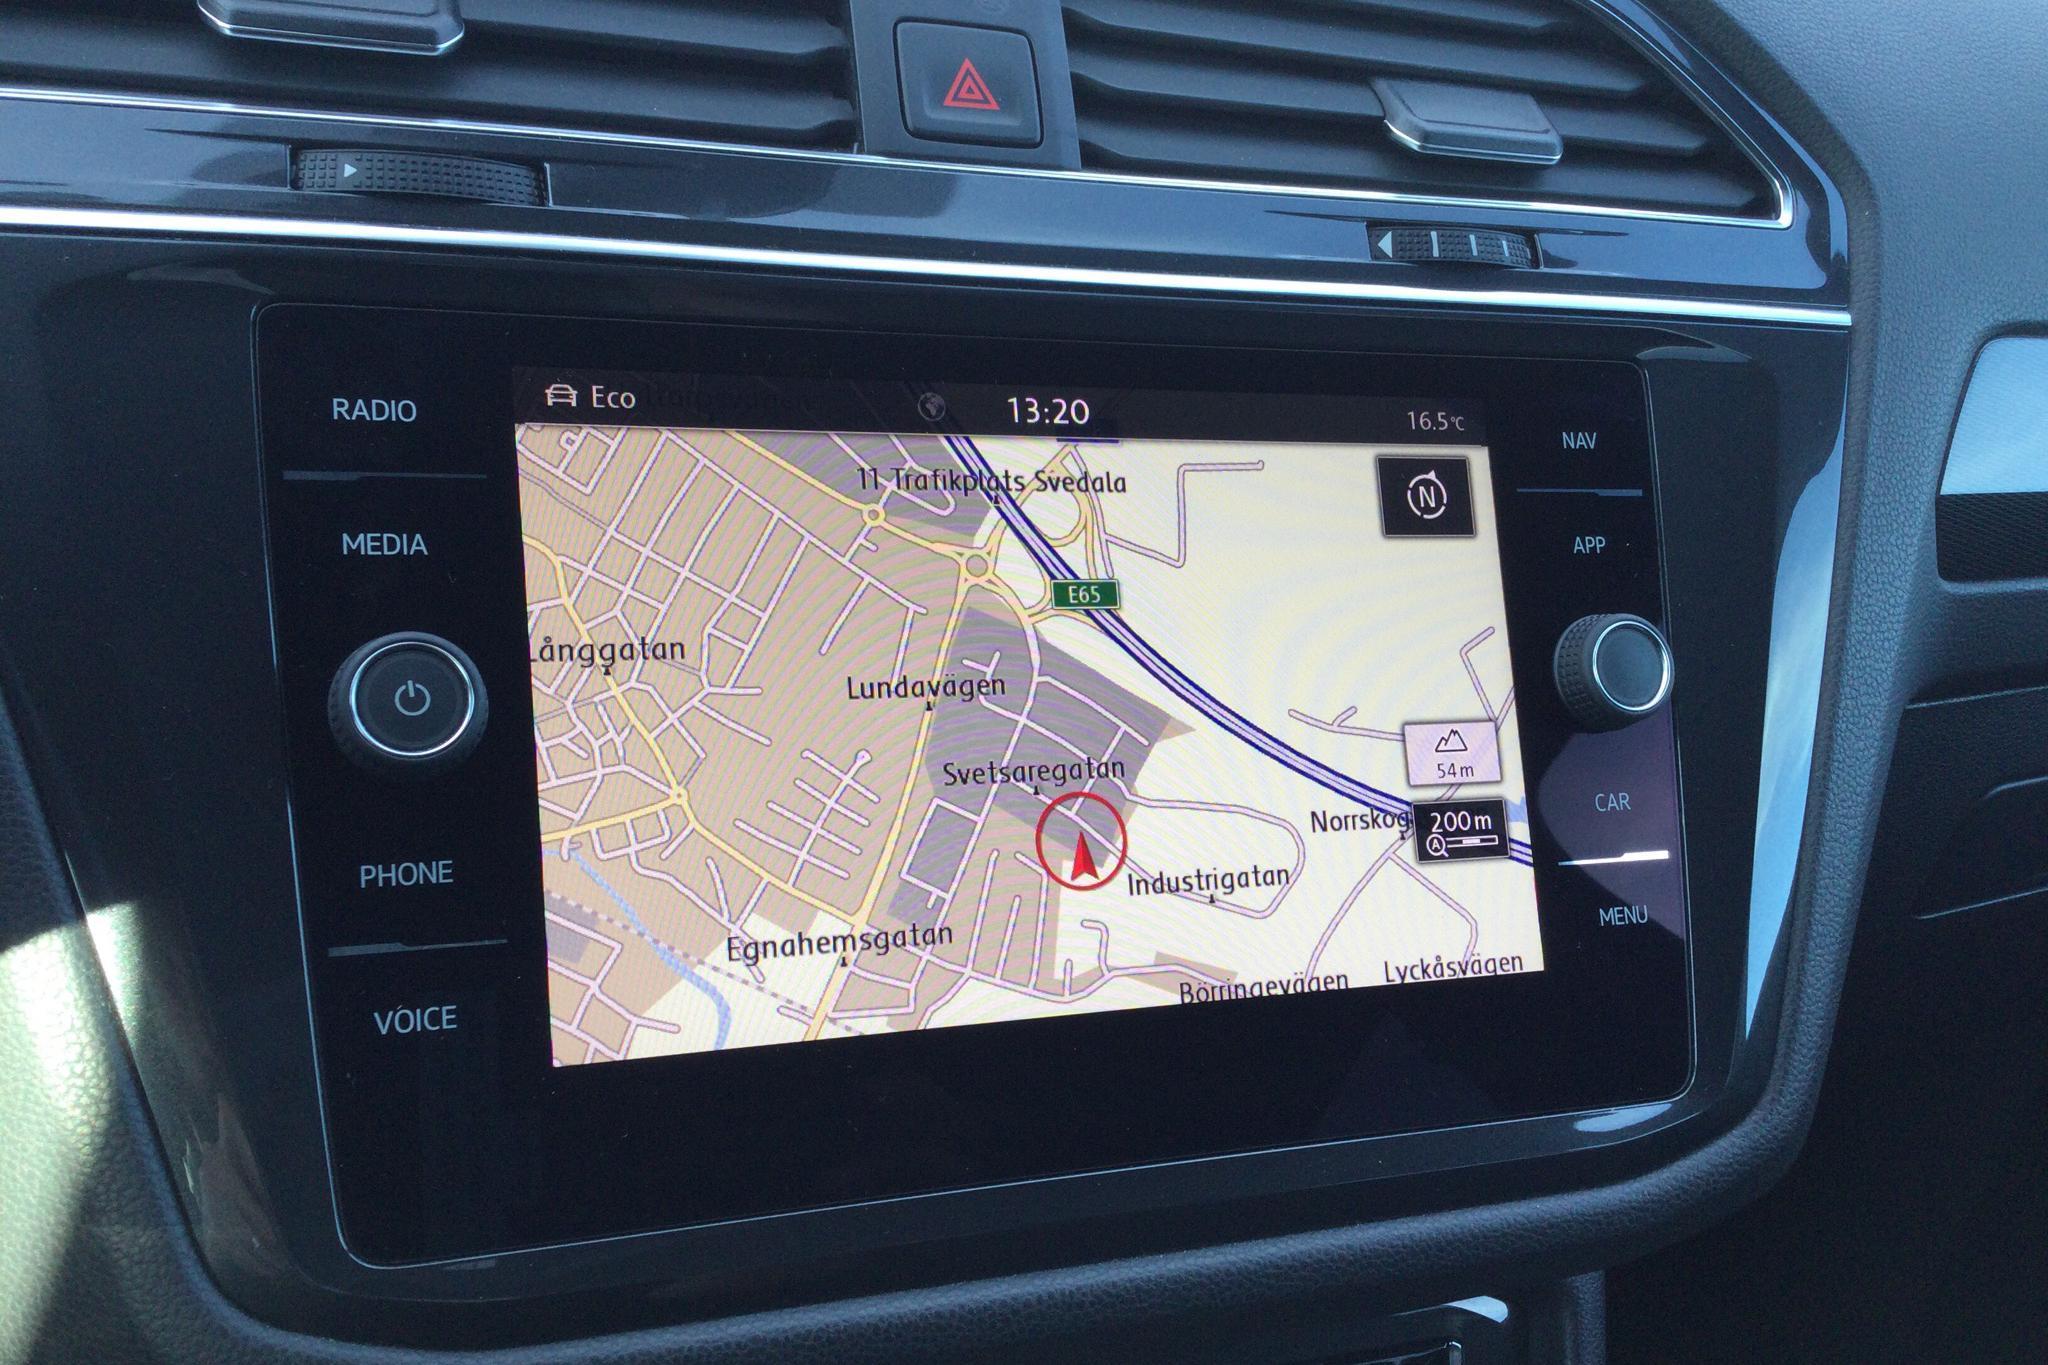 VW Tiguan Allspace 2.0 TDI 4MOTION (190hk) - 7 058 mil - Automat - Dark Green - 2019